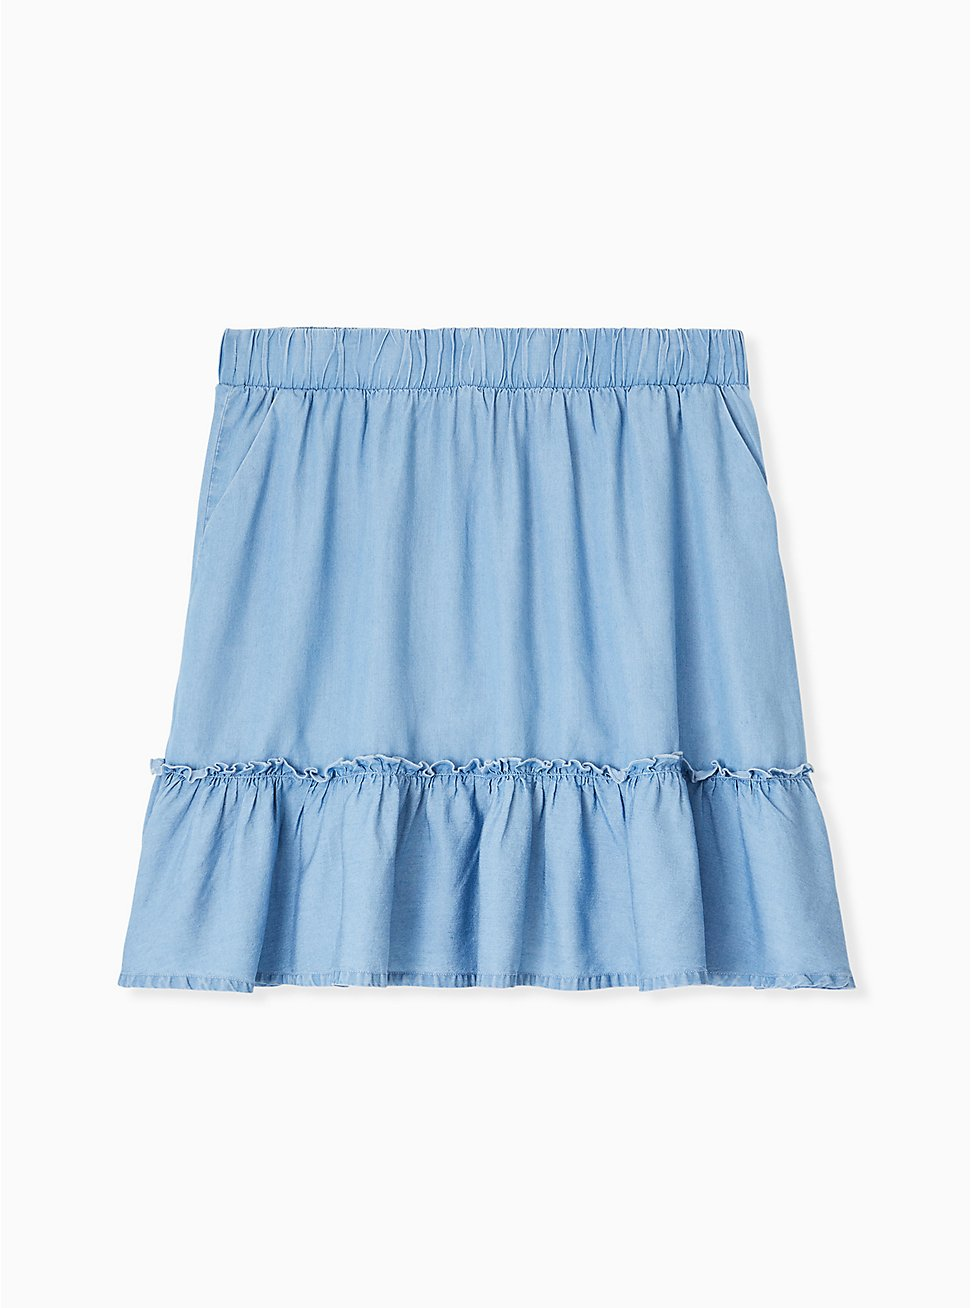 Blue Chambray Ruffle Mini Skirt, CHAMBRAY, hi-res